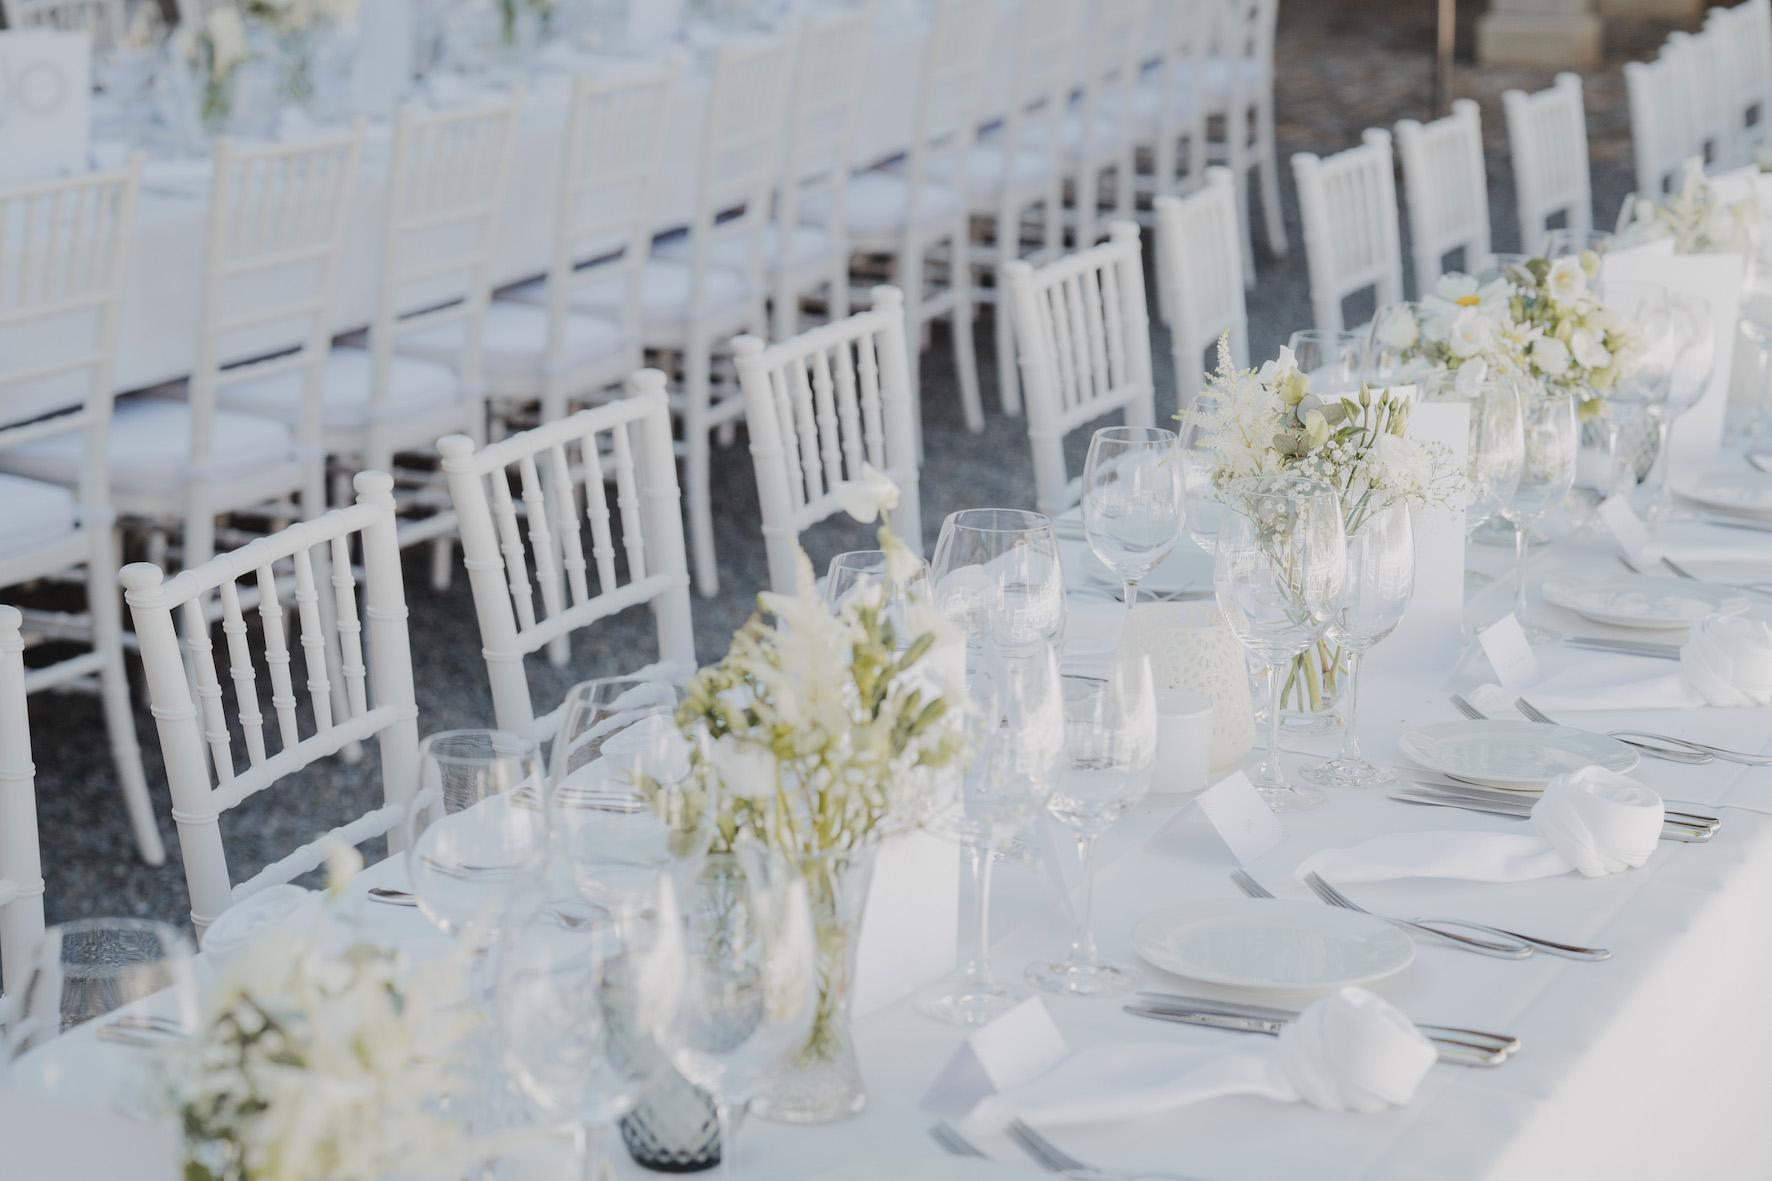 201807274504JC_wedding-0139620180824-Kopie.jpg